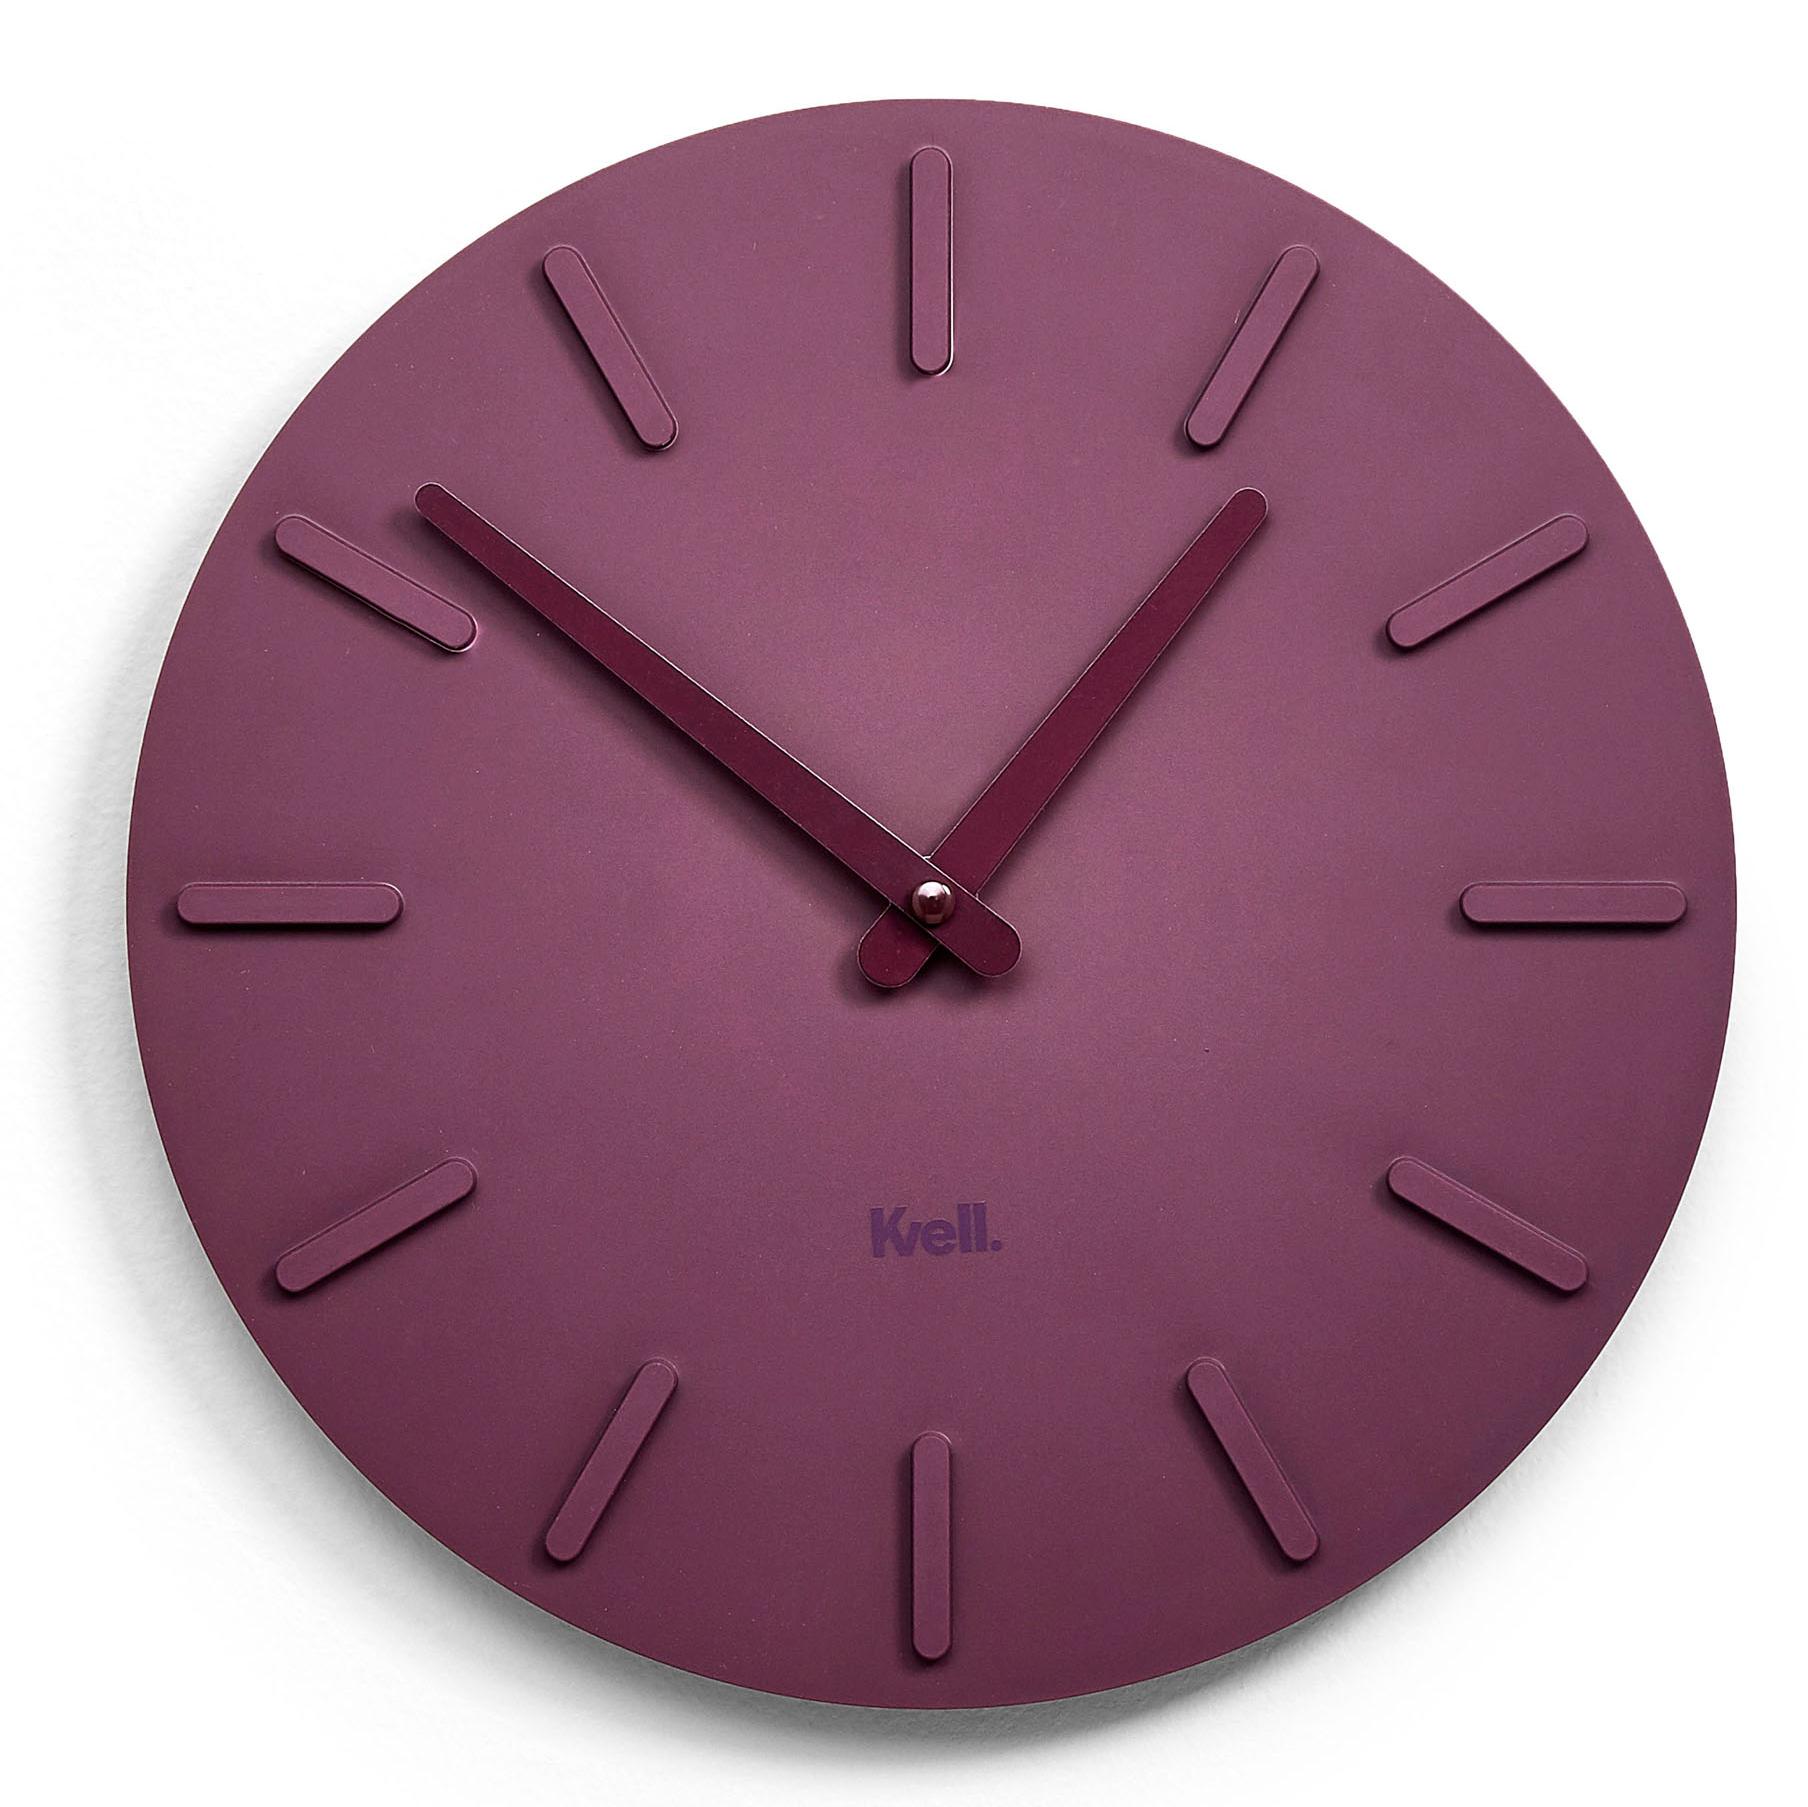 monochromatic kvell pop clock